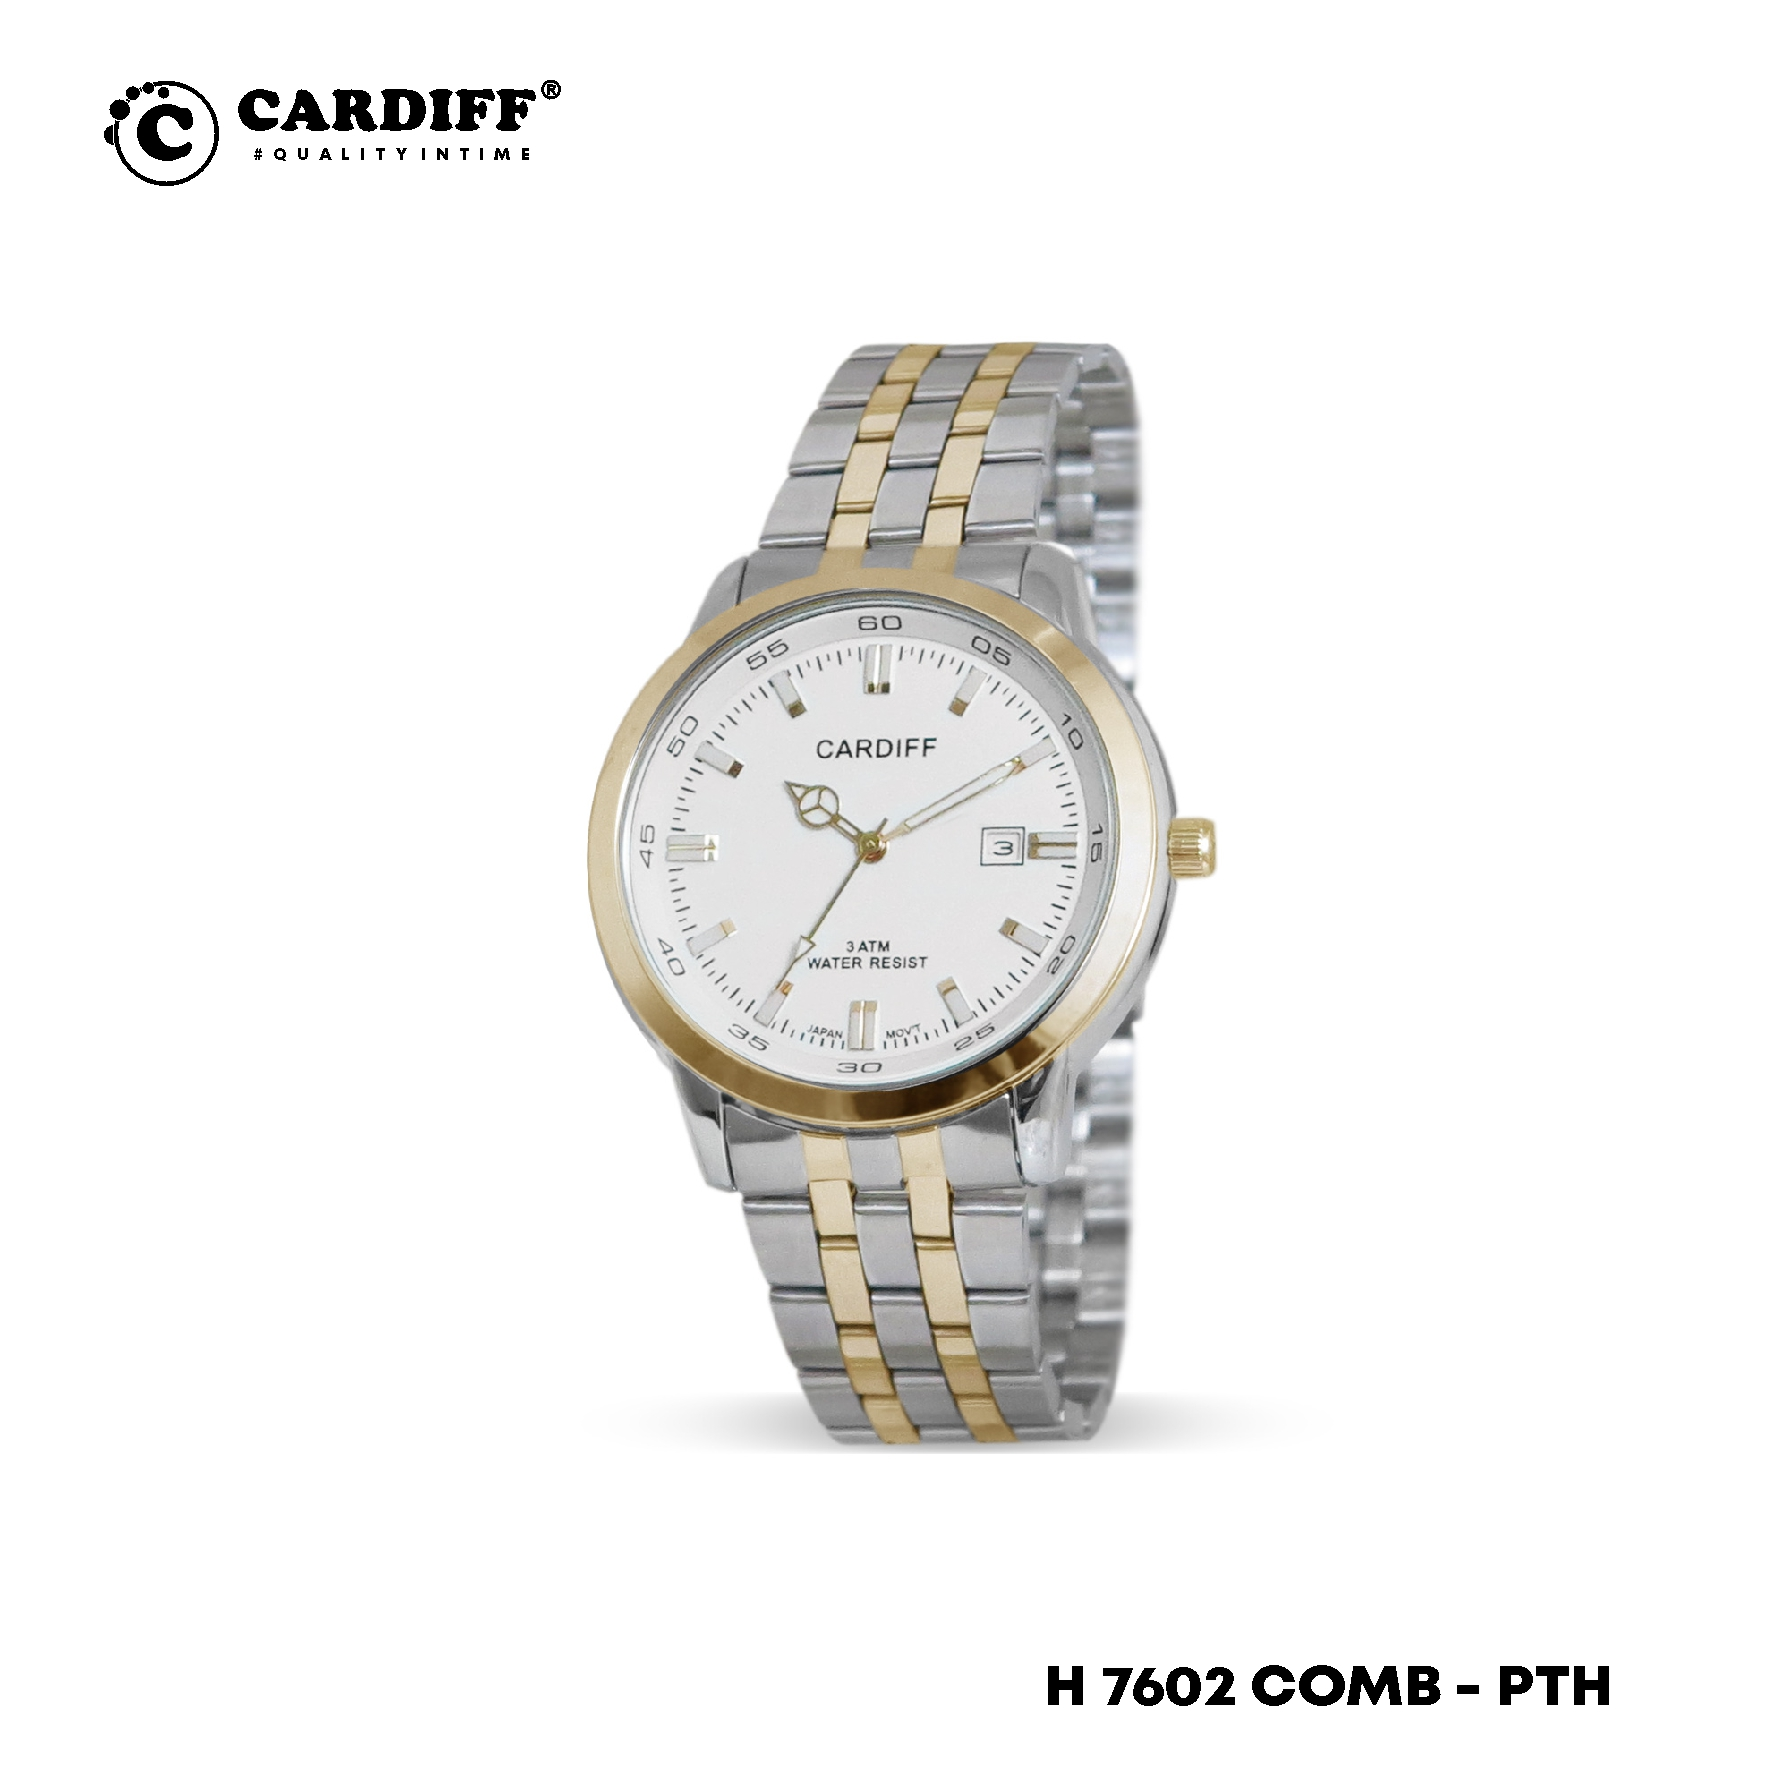 CARDIFF ANALOG H 7602 SERIES